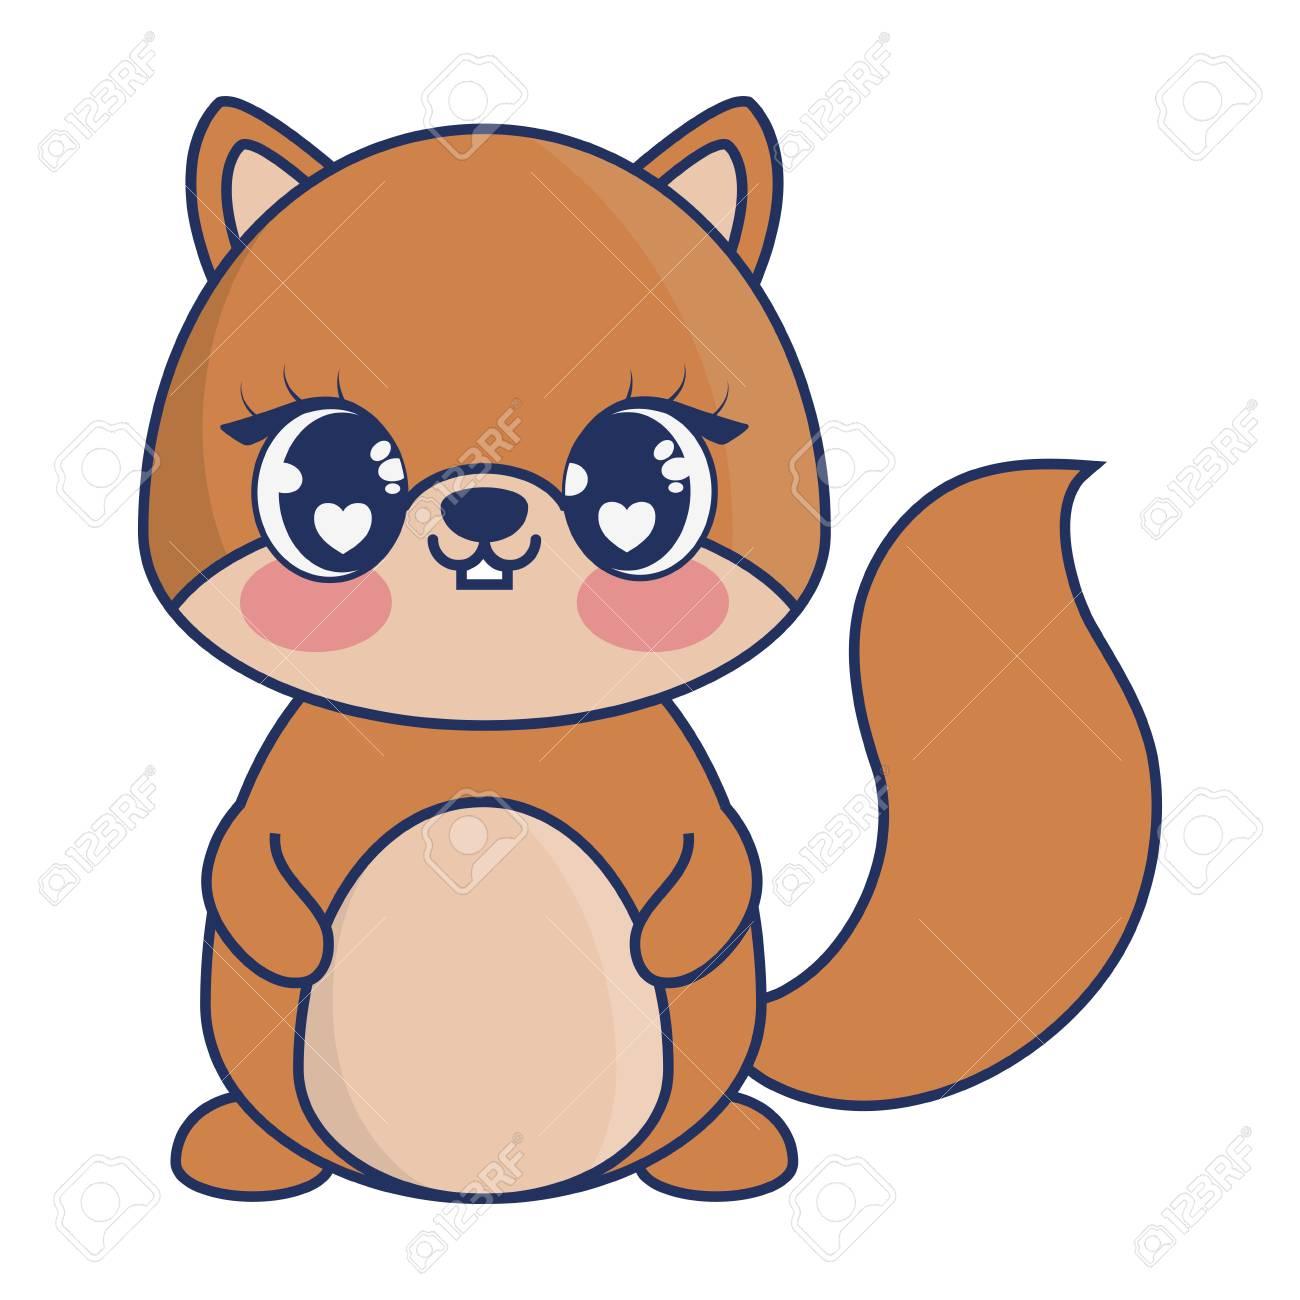 cute chipmunk adorable character vector illustration design.